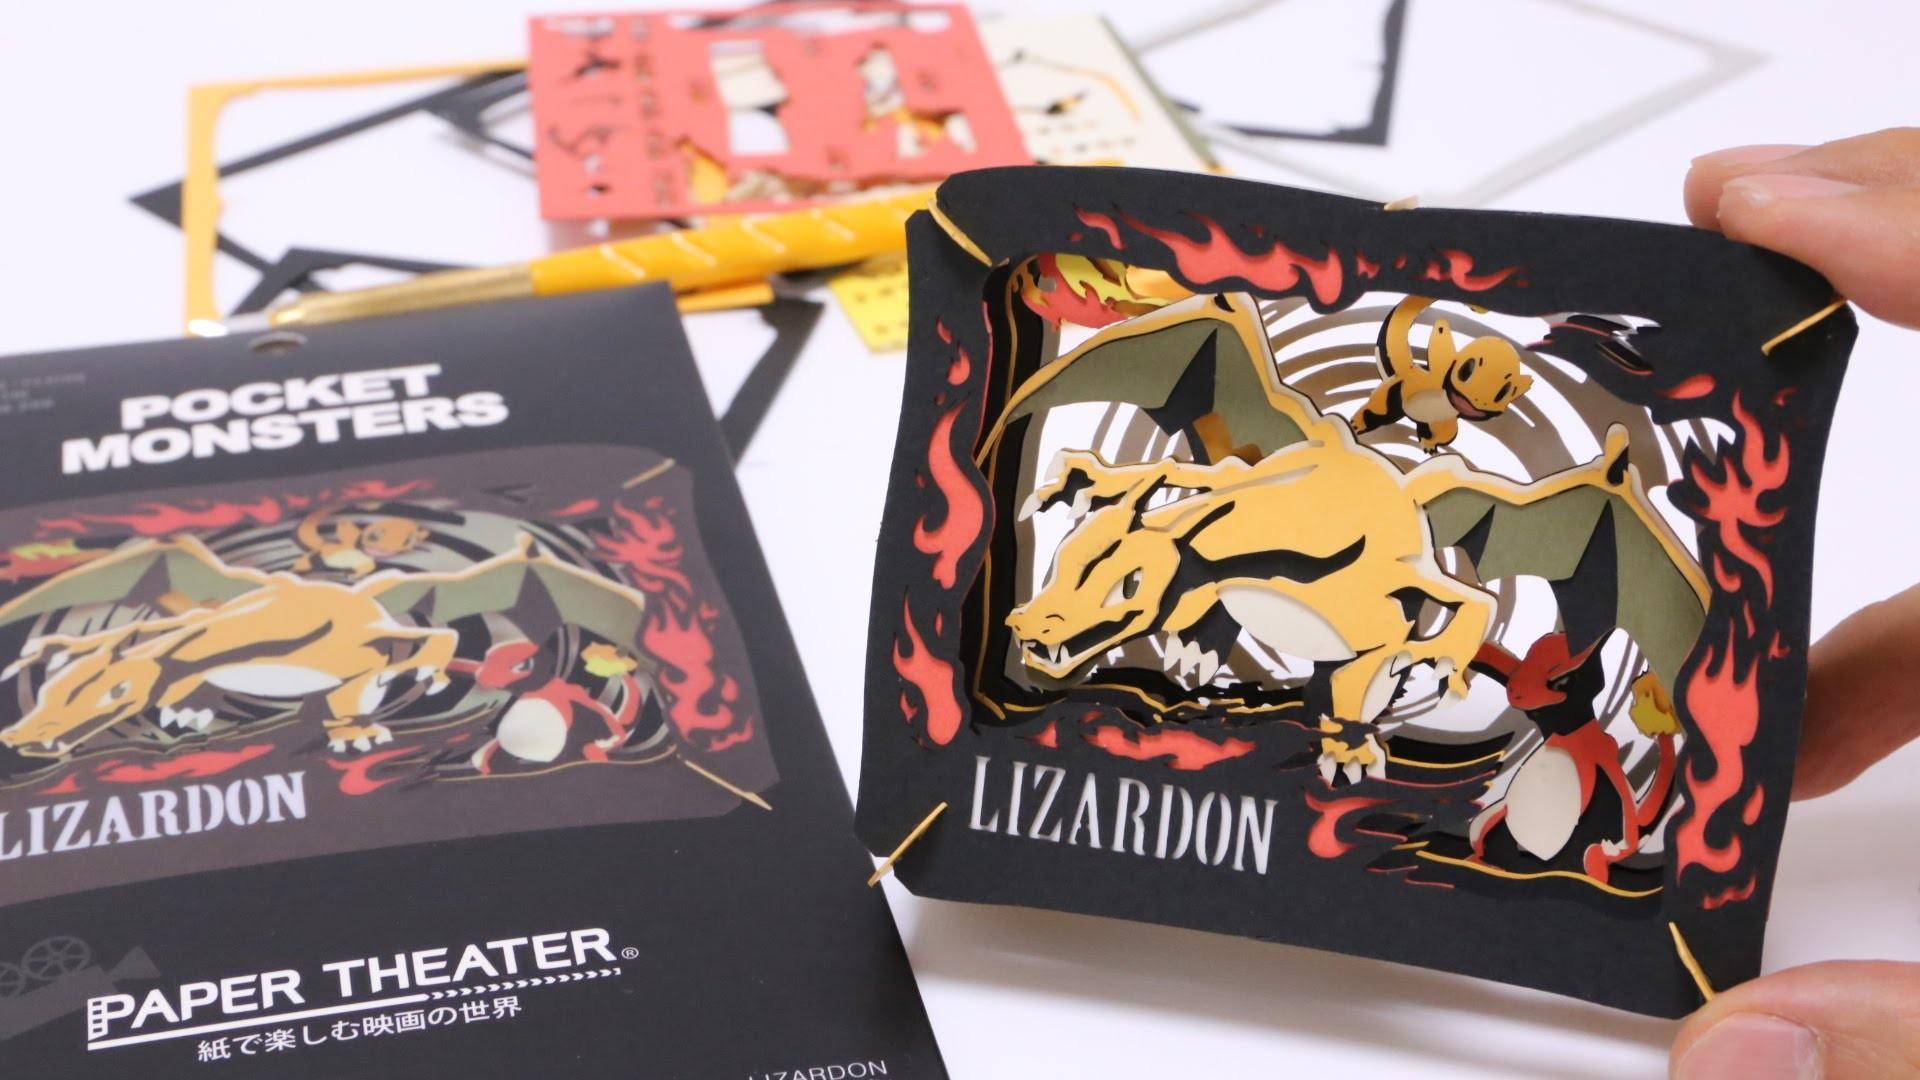 Pokemon DIY Paper Craft Lizardon Paper Theater